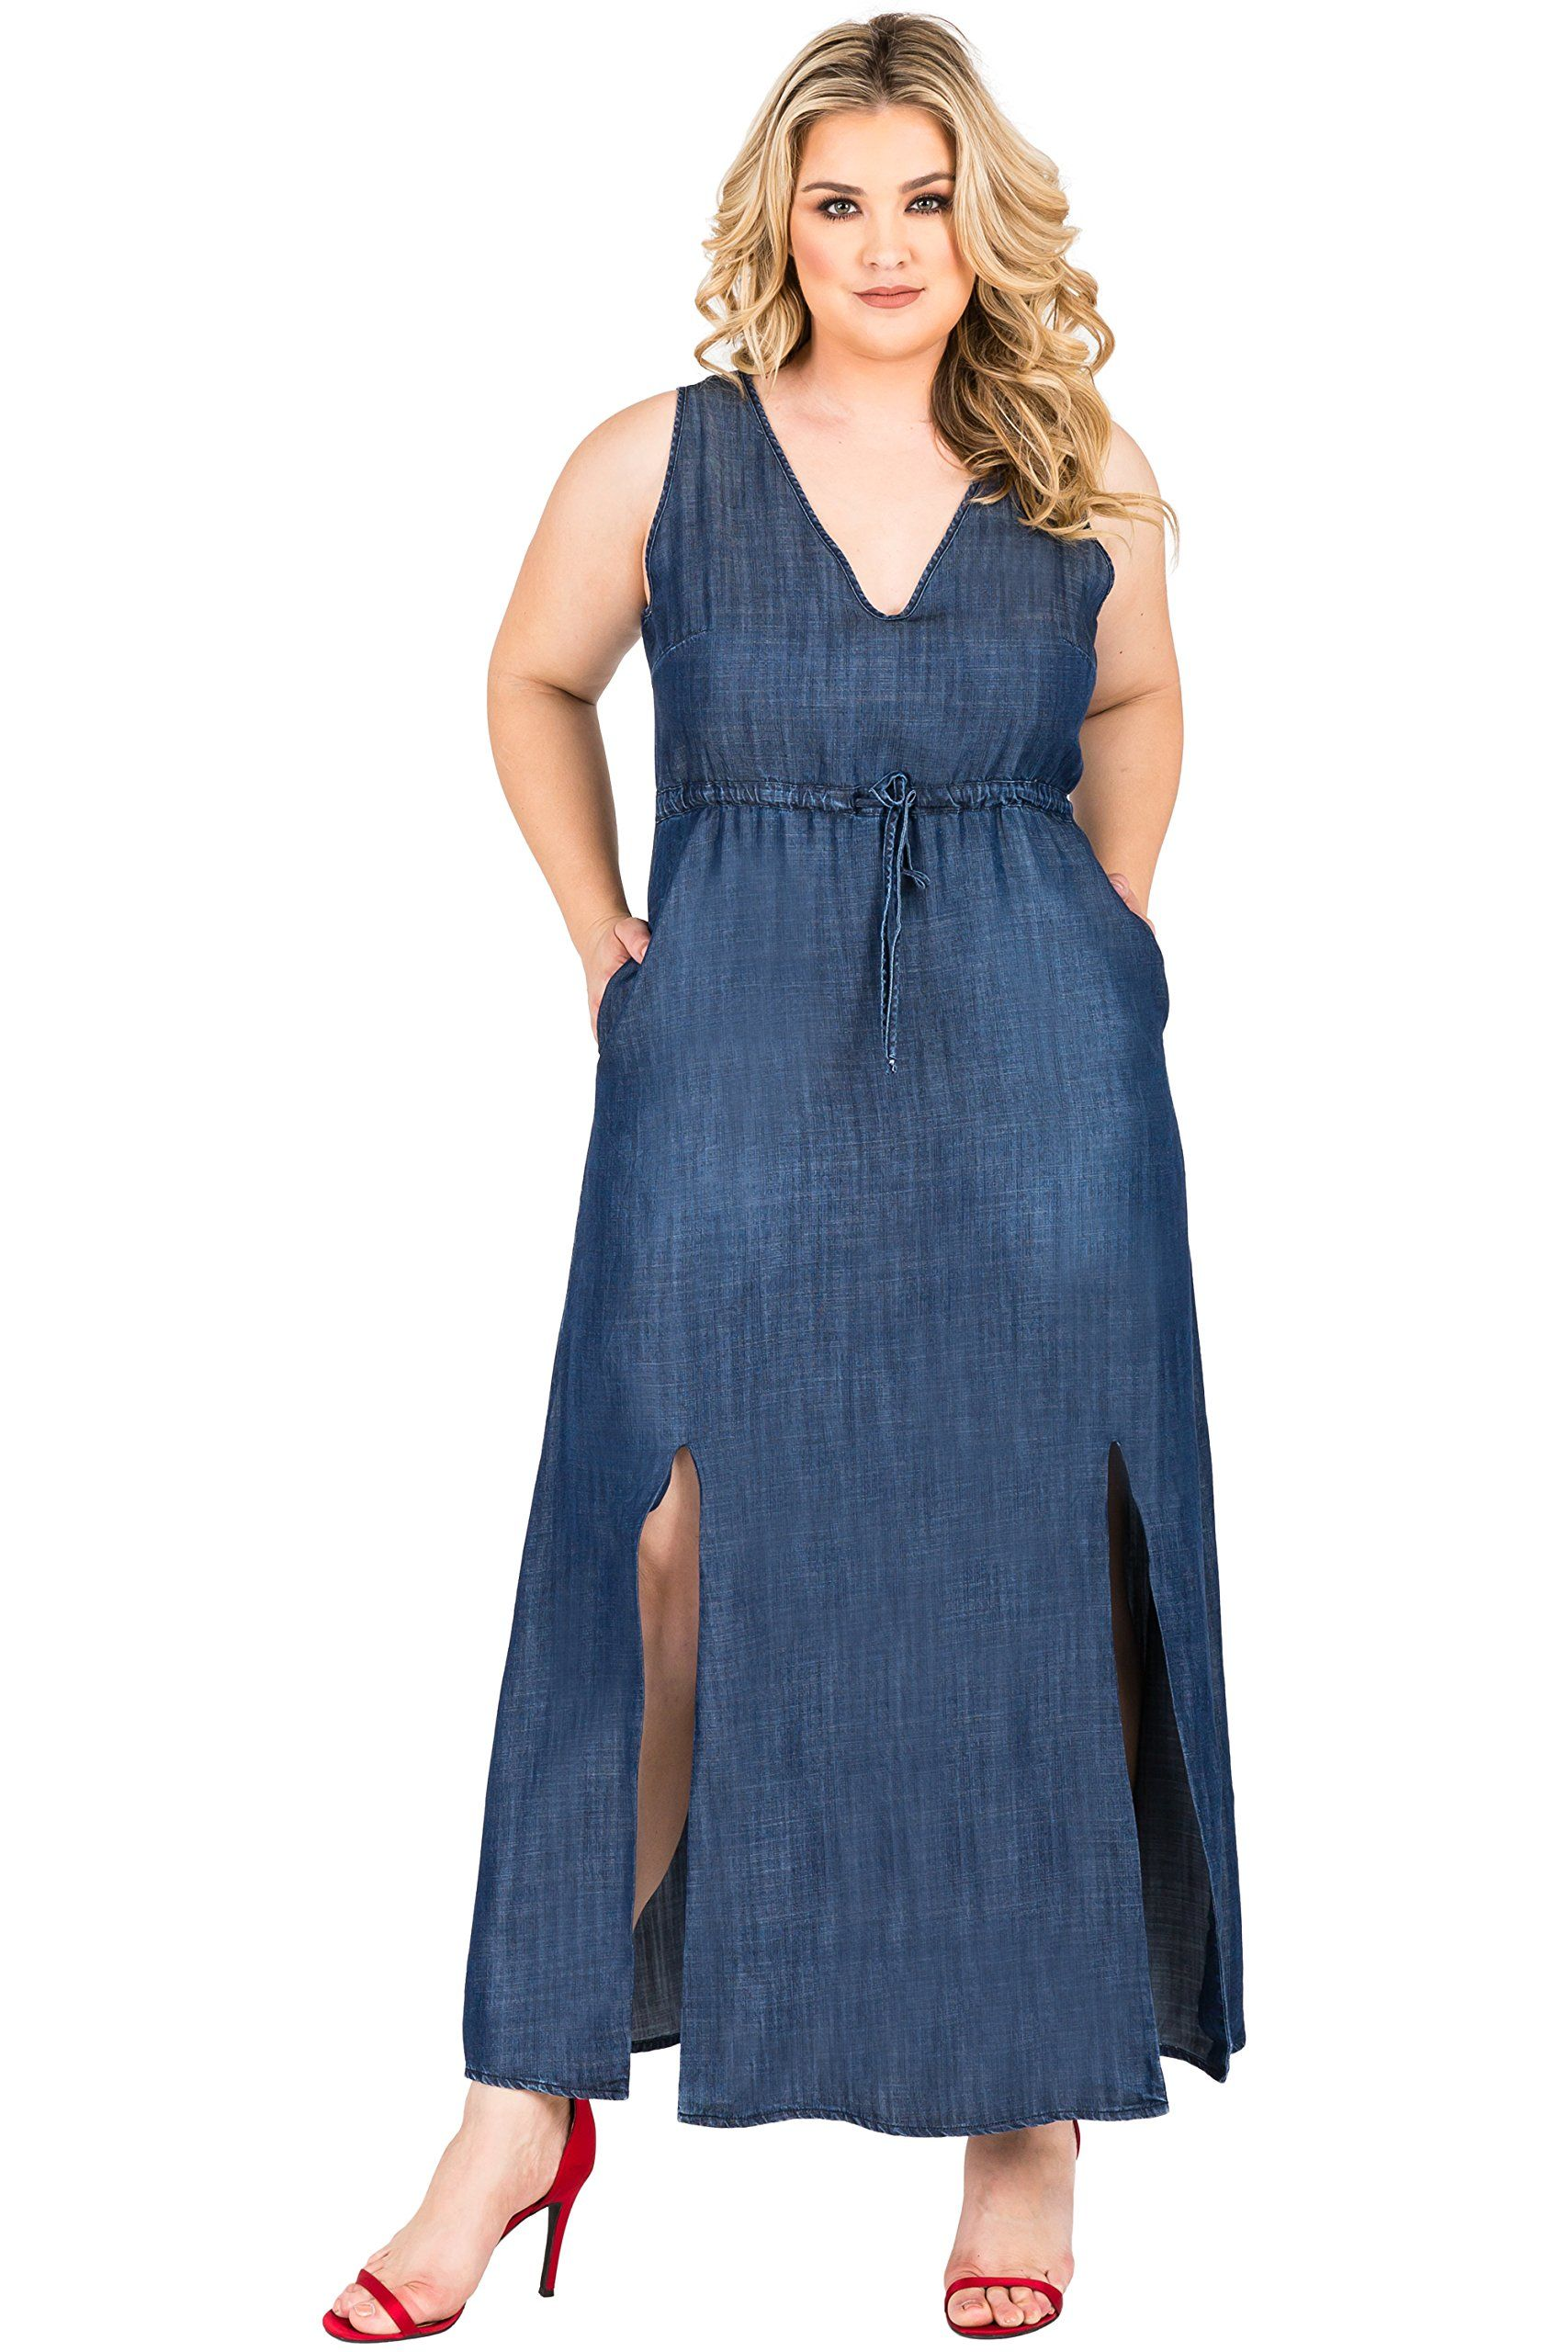 b9e7a06eaa7 Fashion Bug Plus Size Tencel V-Neck Double Slit Sleeveless Maxi Dress Size  2X www.fashionbug.us #plussize #fashionbug #dress #curvy